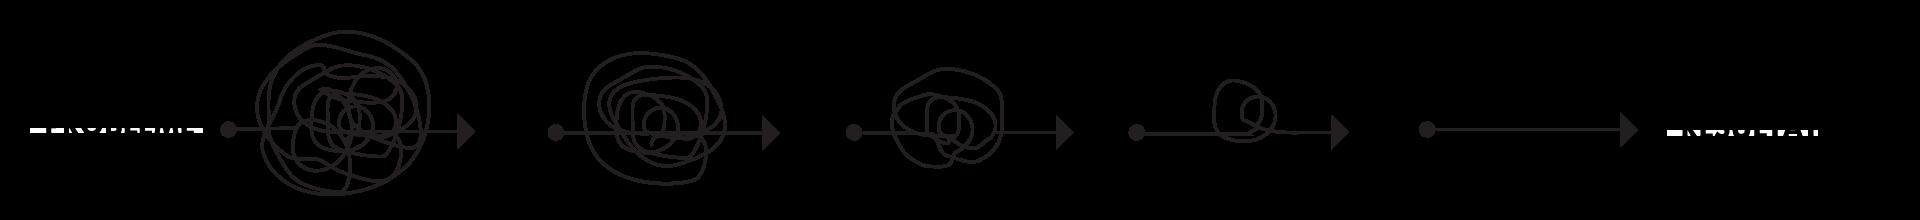 PROBLEME-RESULTAT-STRATEGIE-MARQUE-CREATIVITE-LEADSCOM